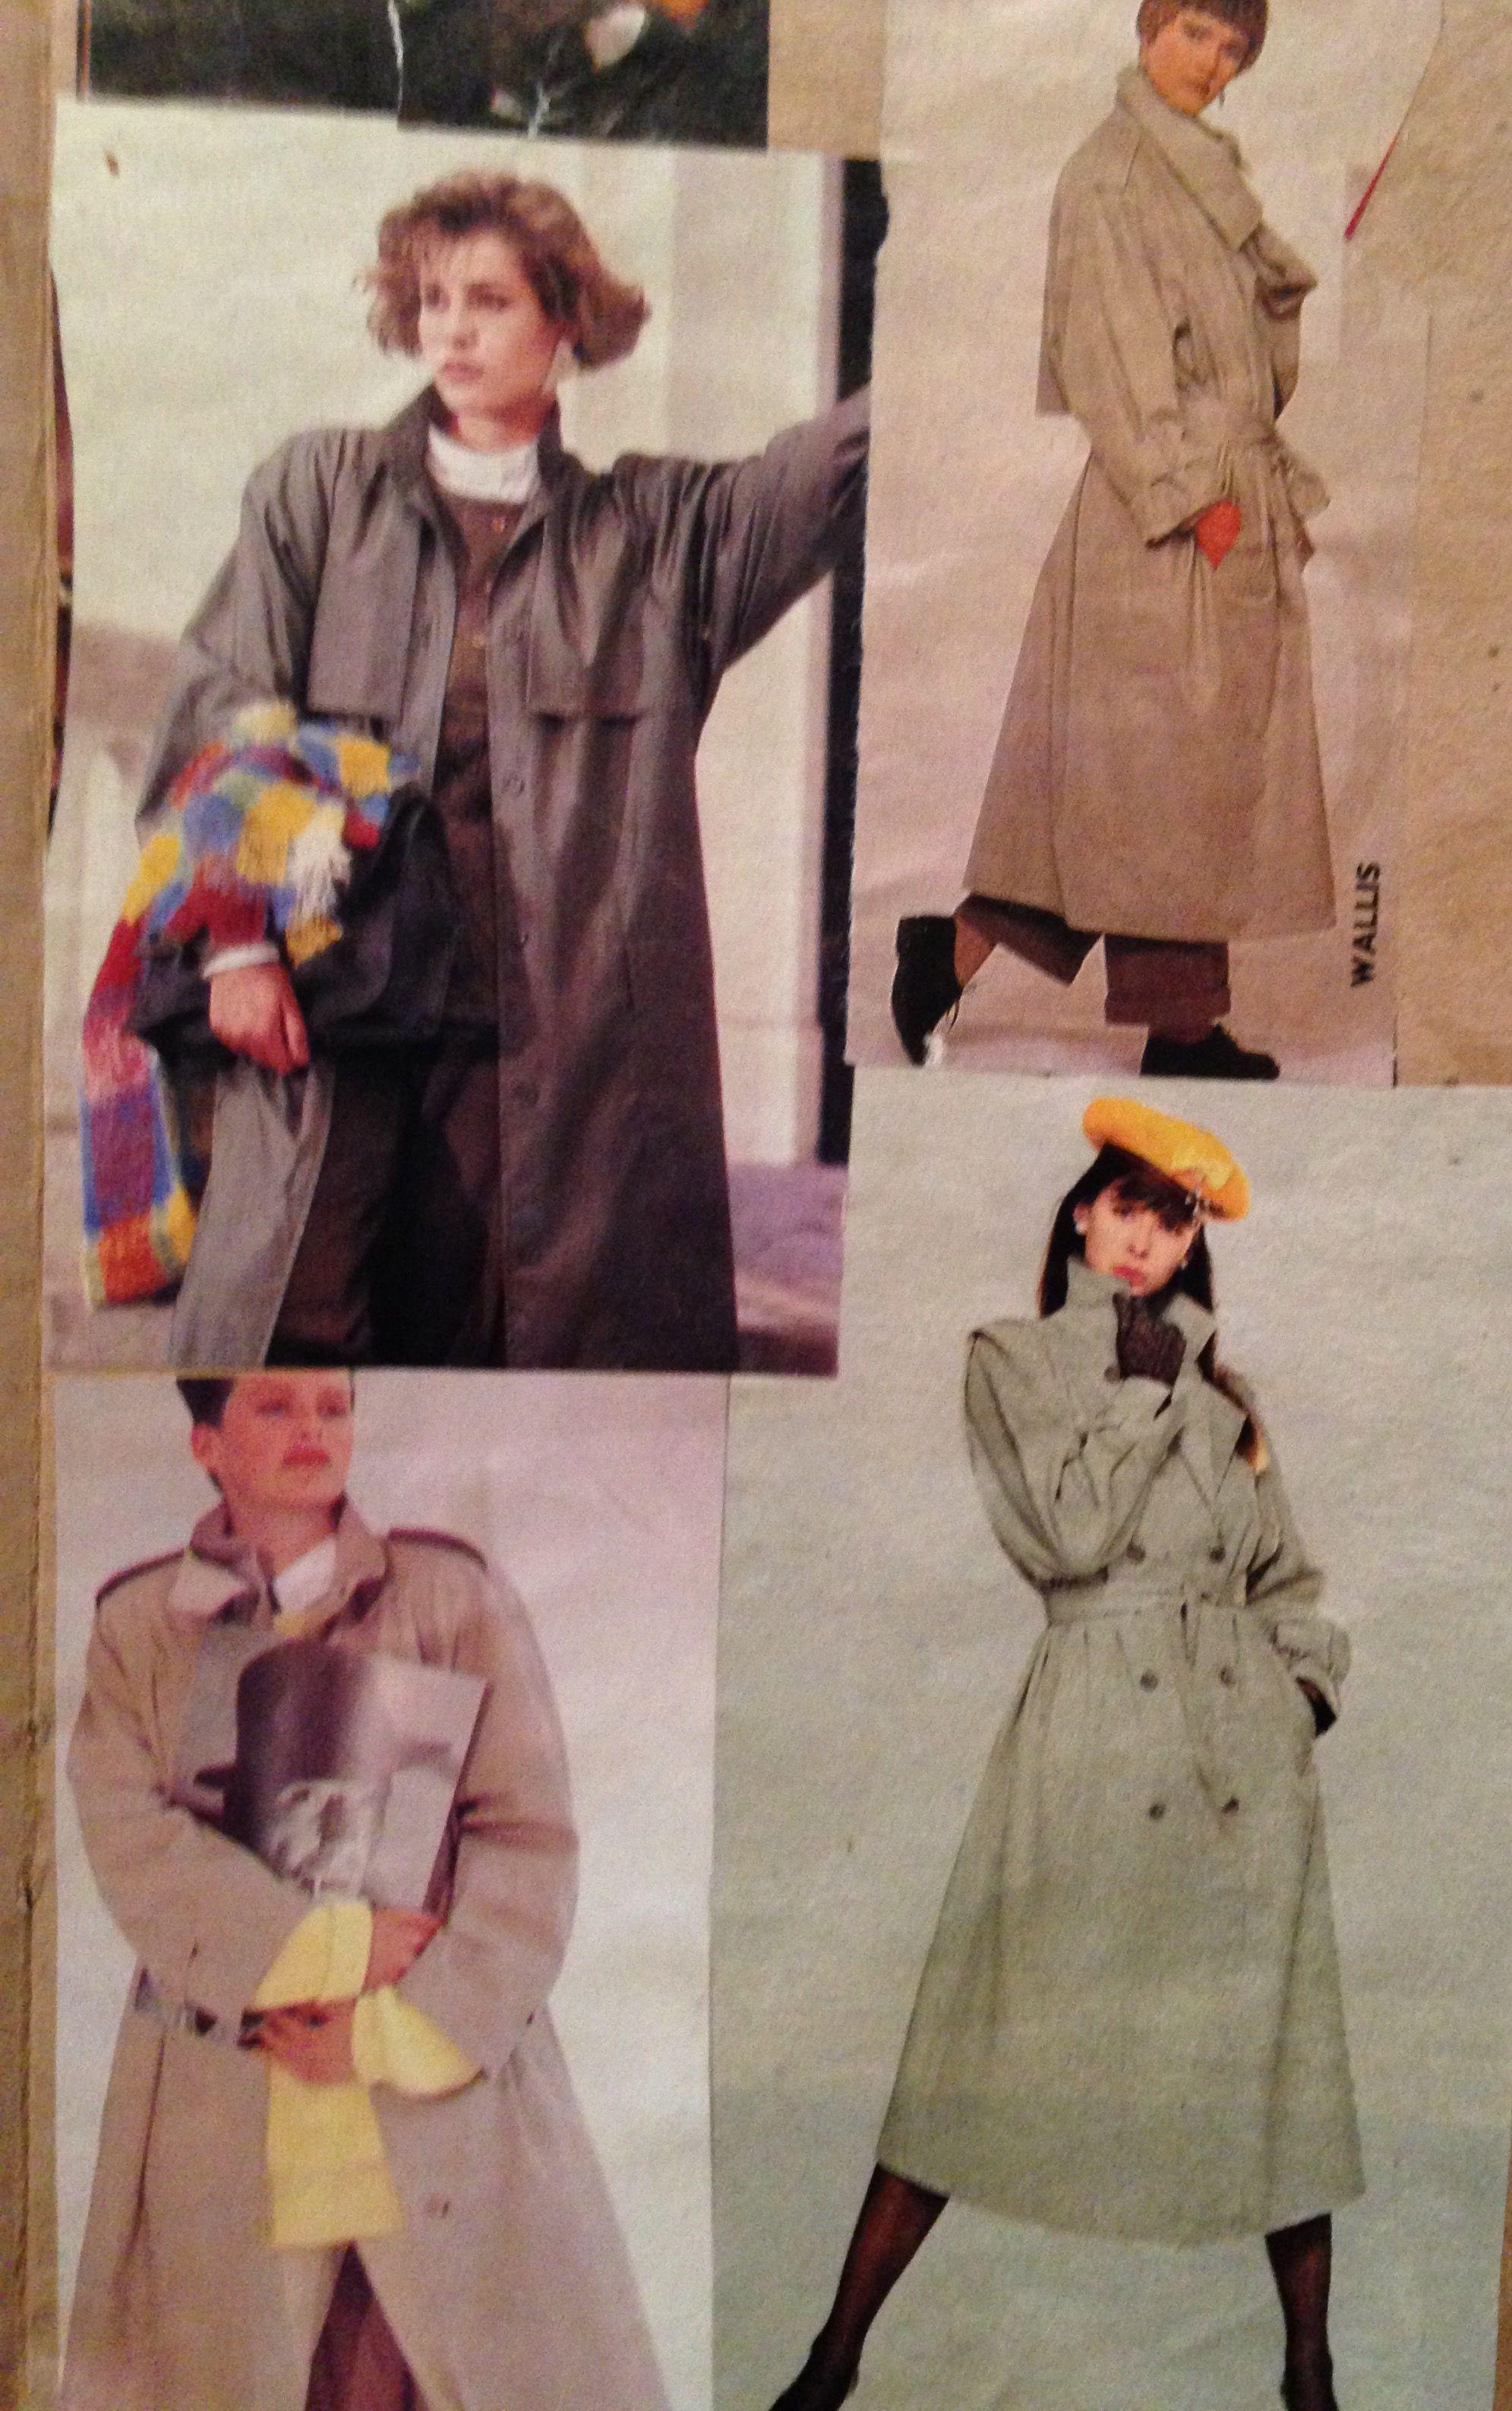 1985 fashion UK raincoats